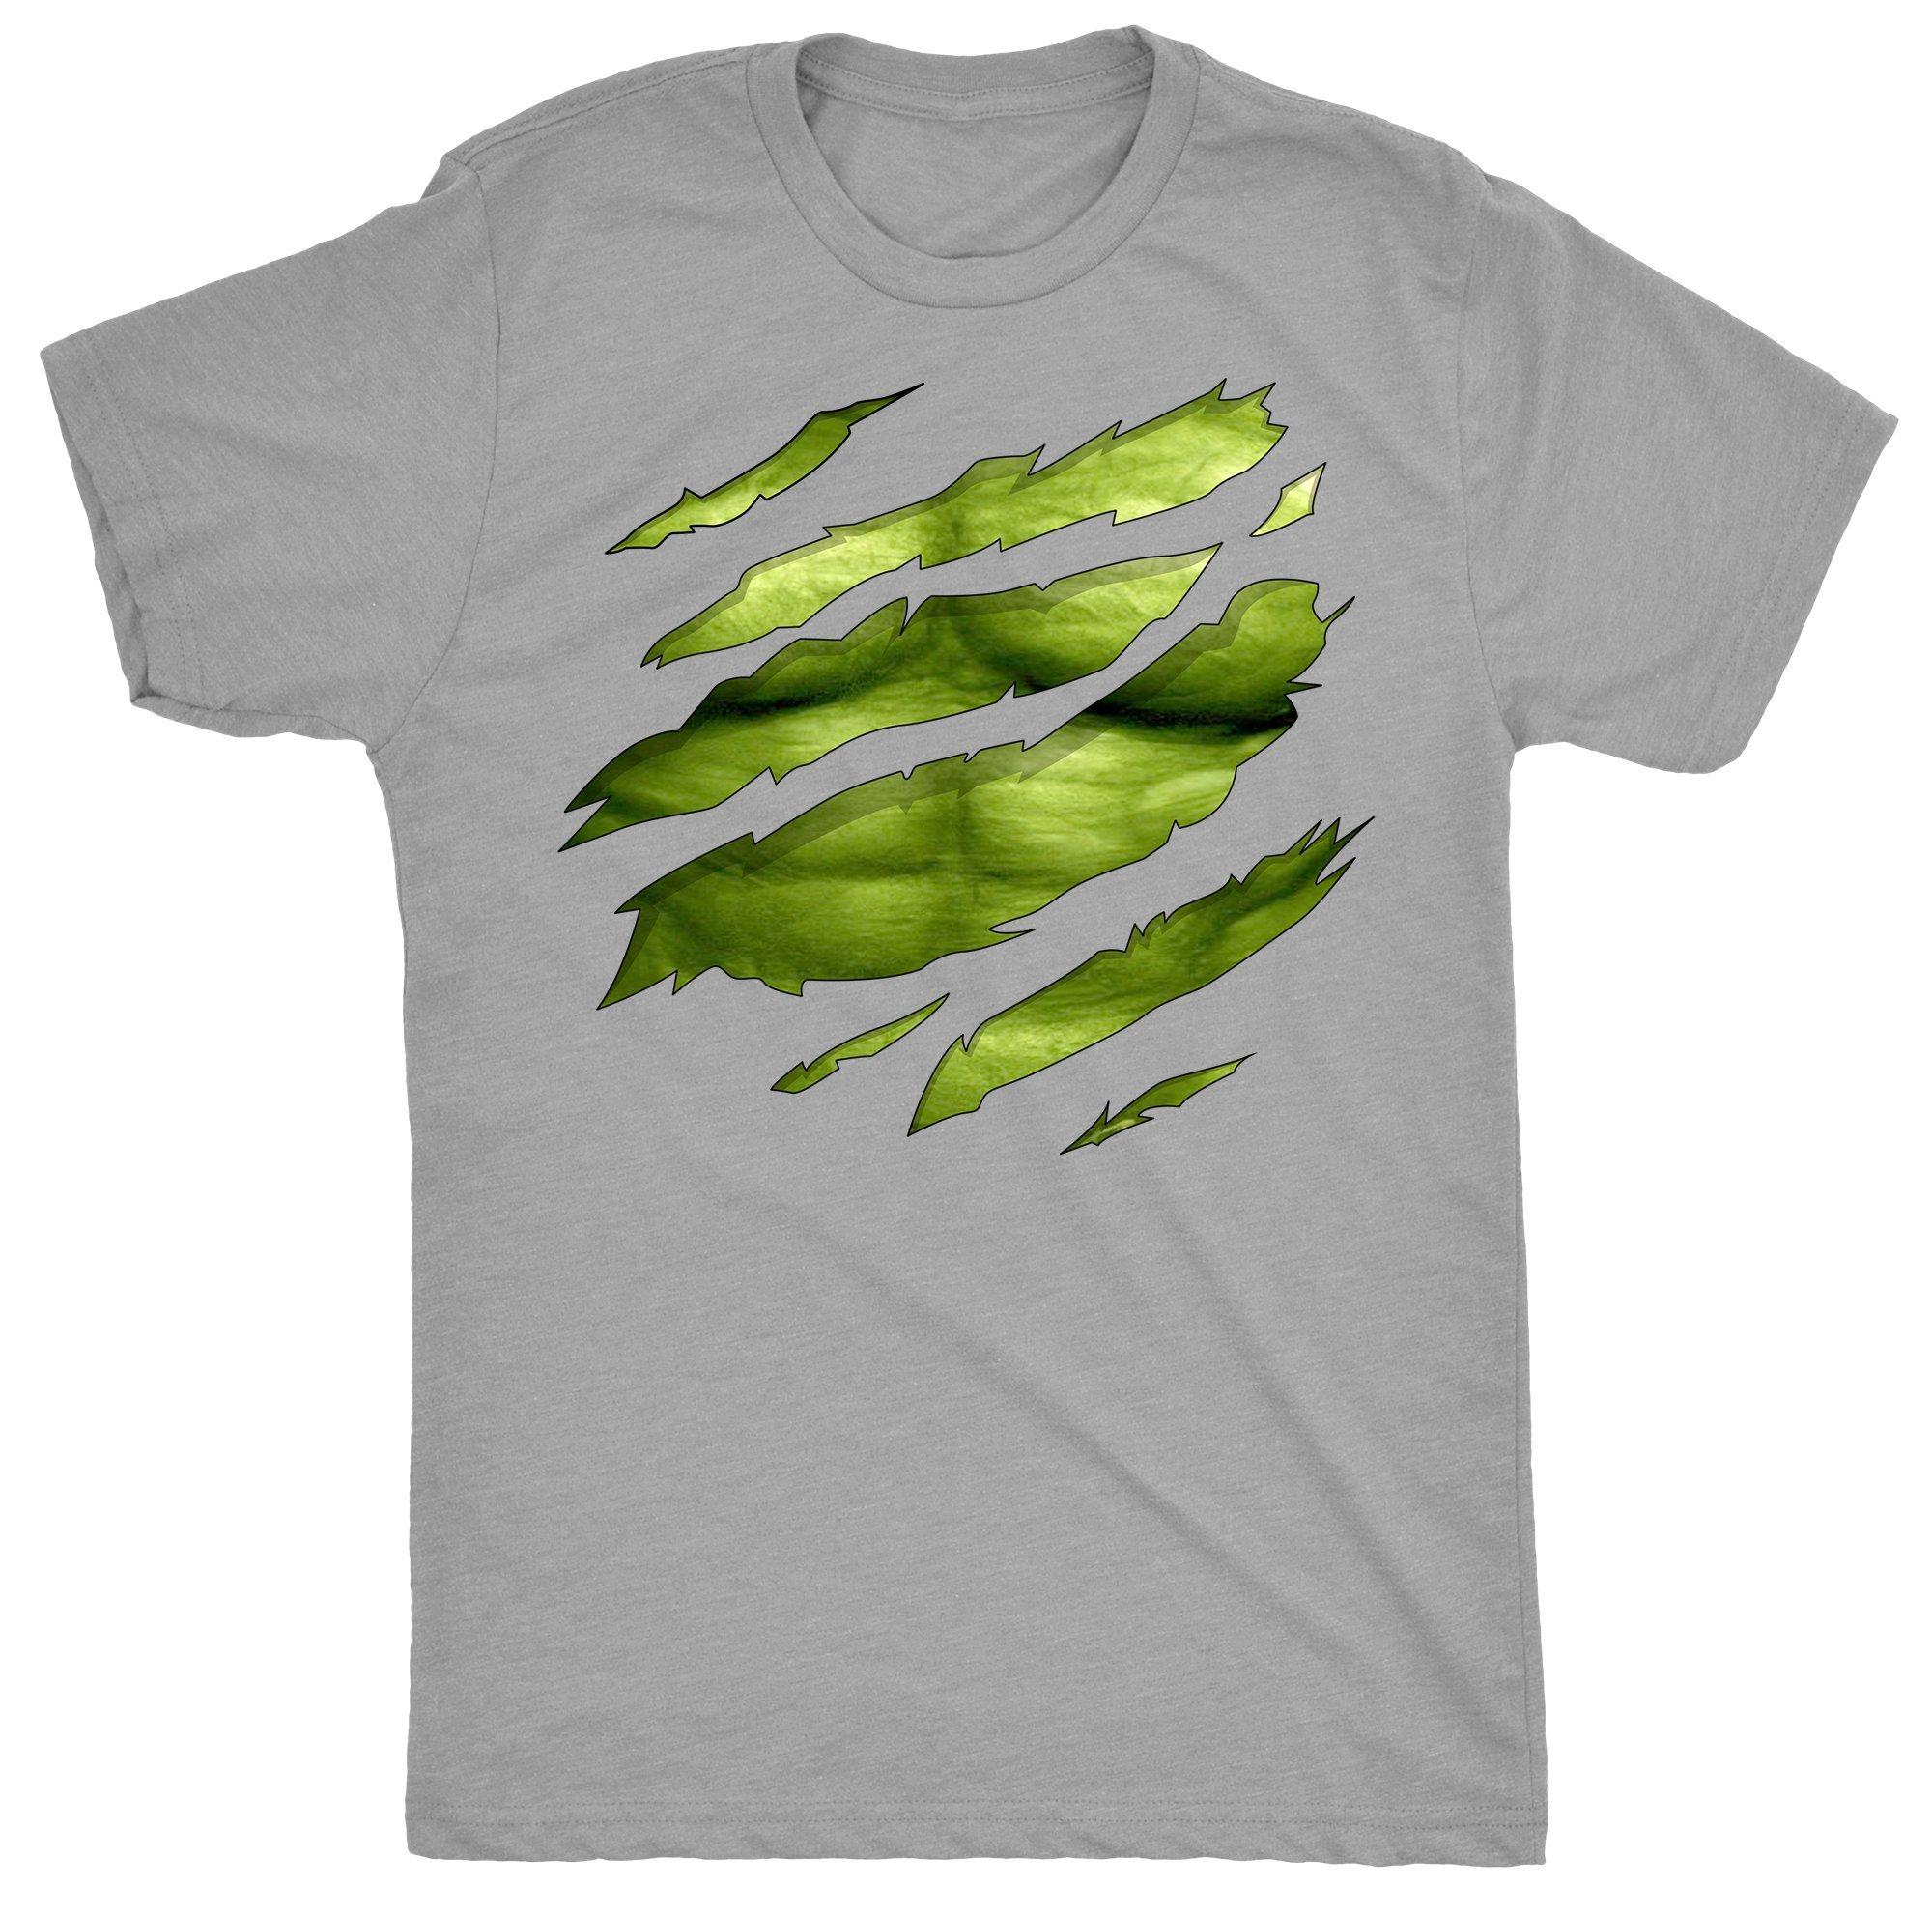 The Big Green Man Chest Under Torn Hommes T Shirt